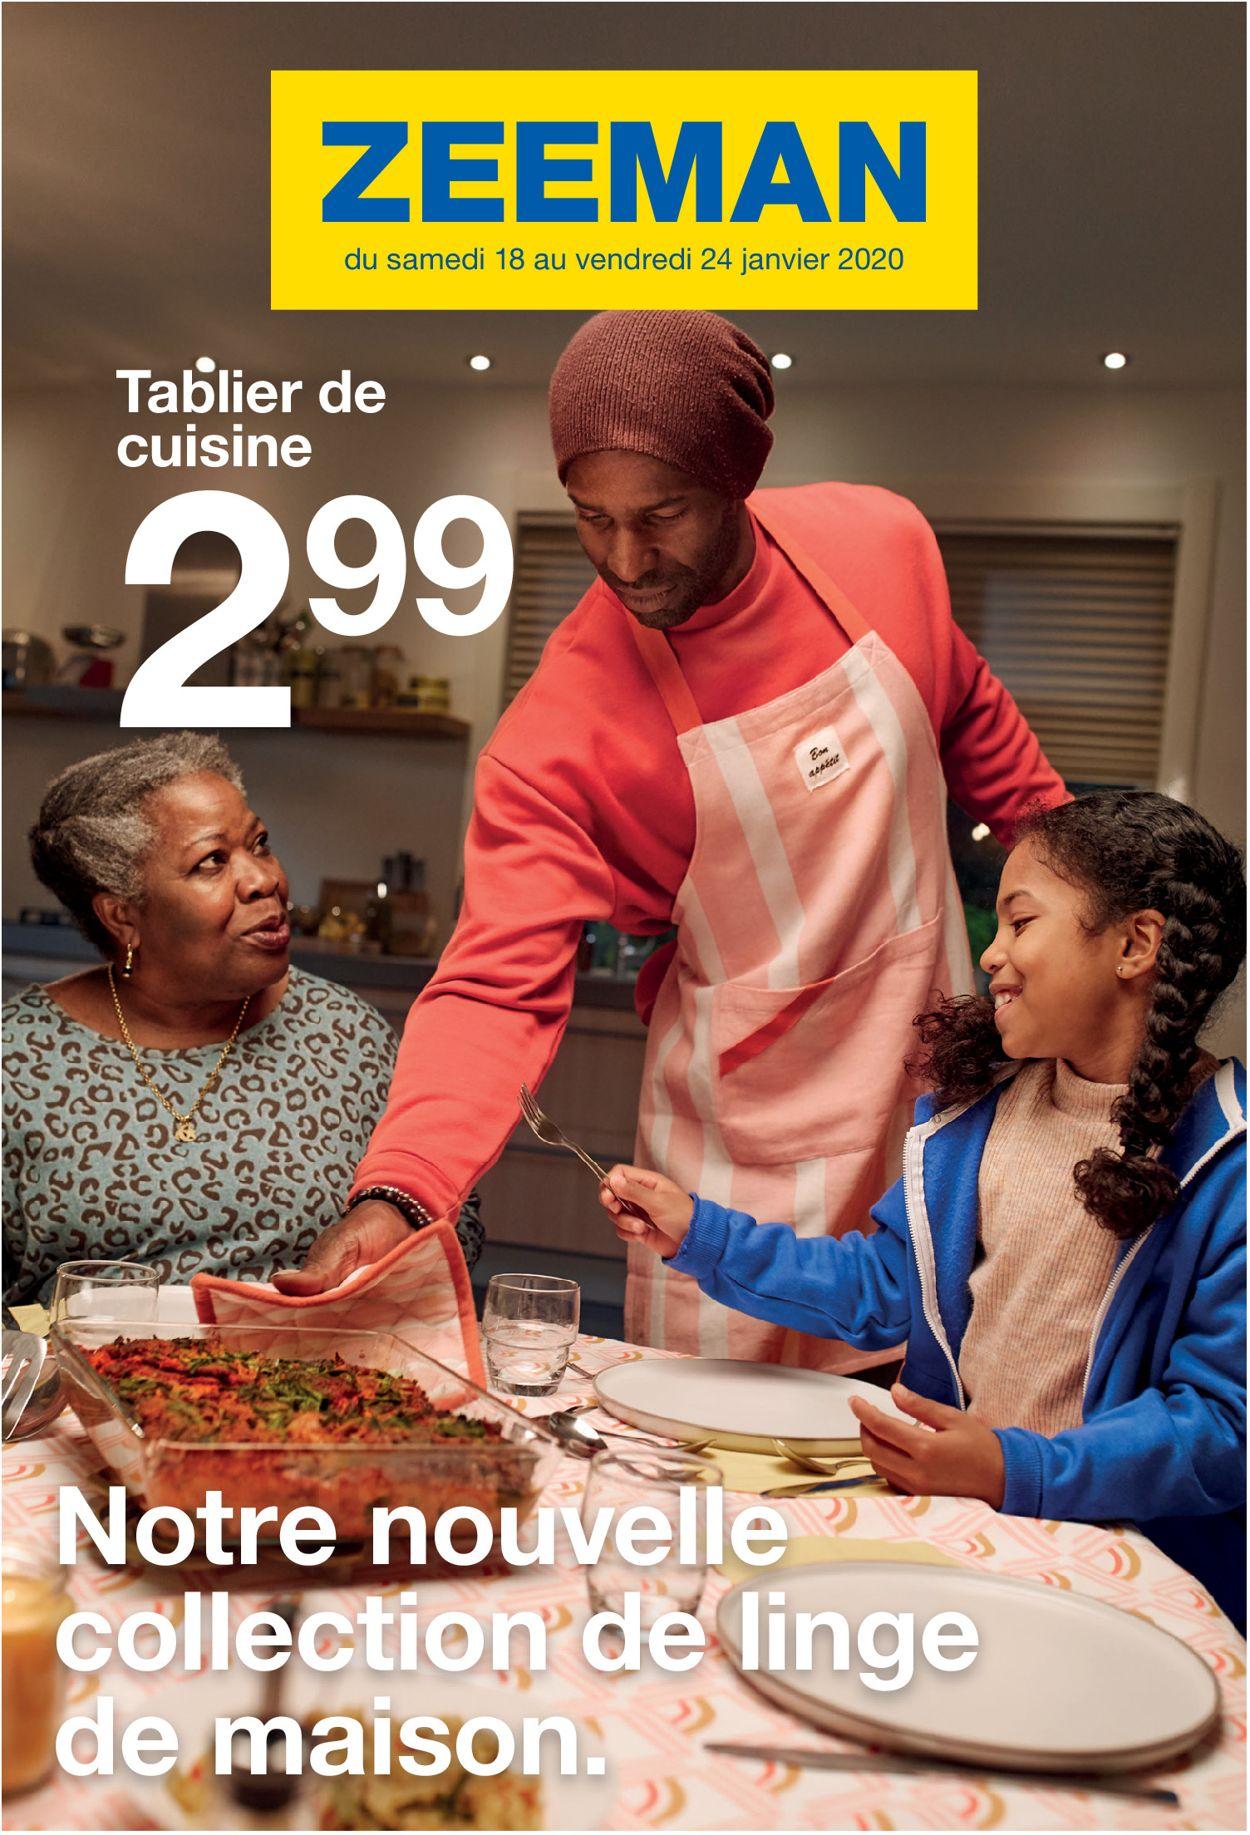 Zeeman Catalogue - 18.01-24.01.2020